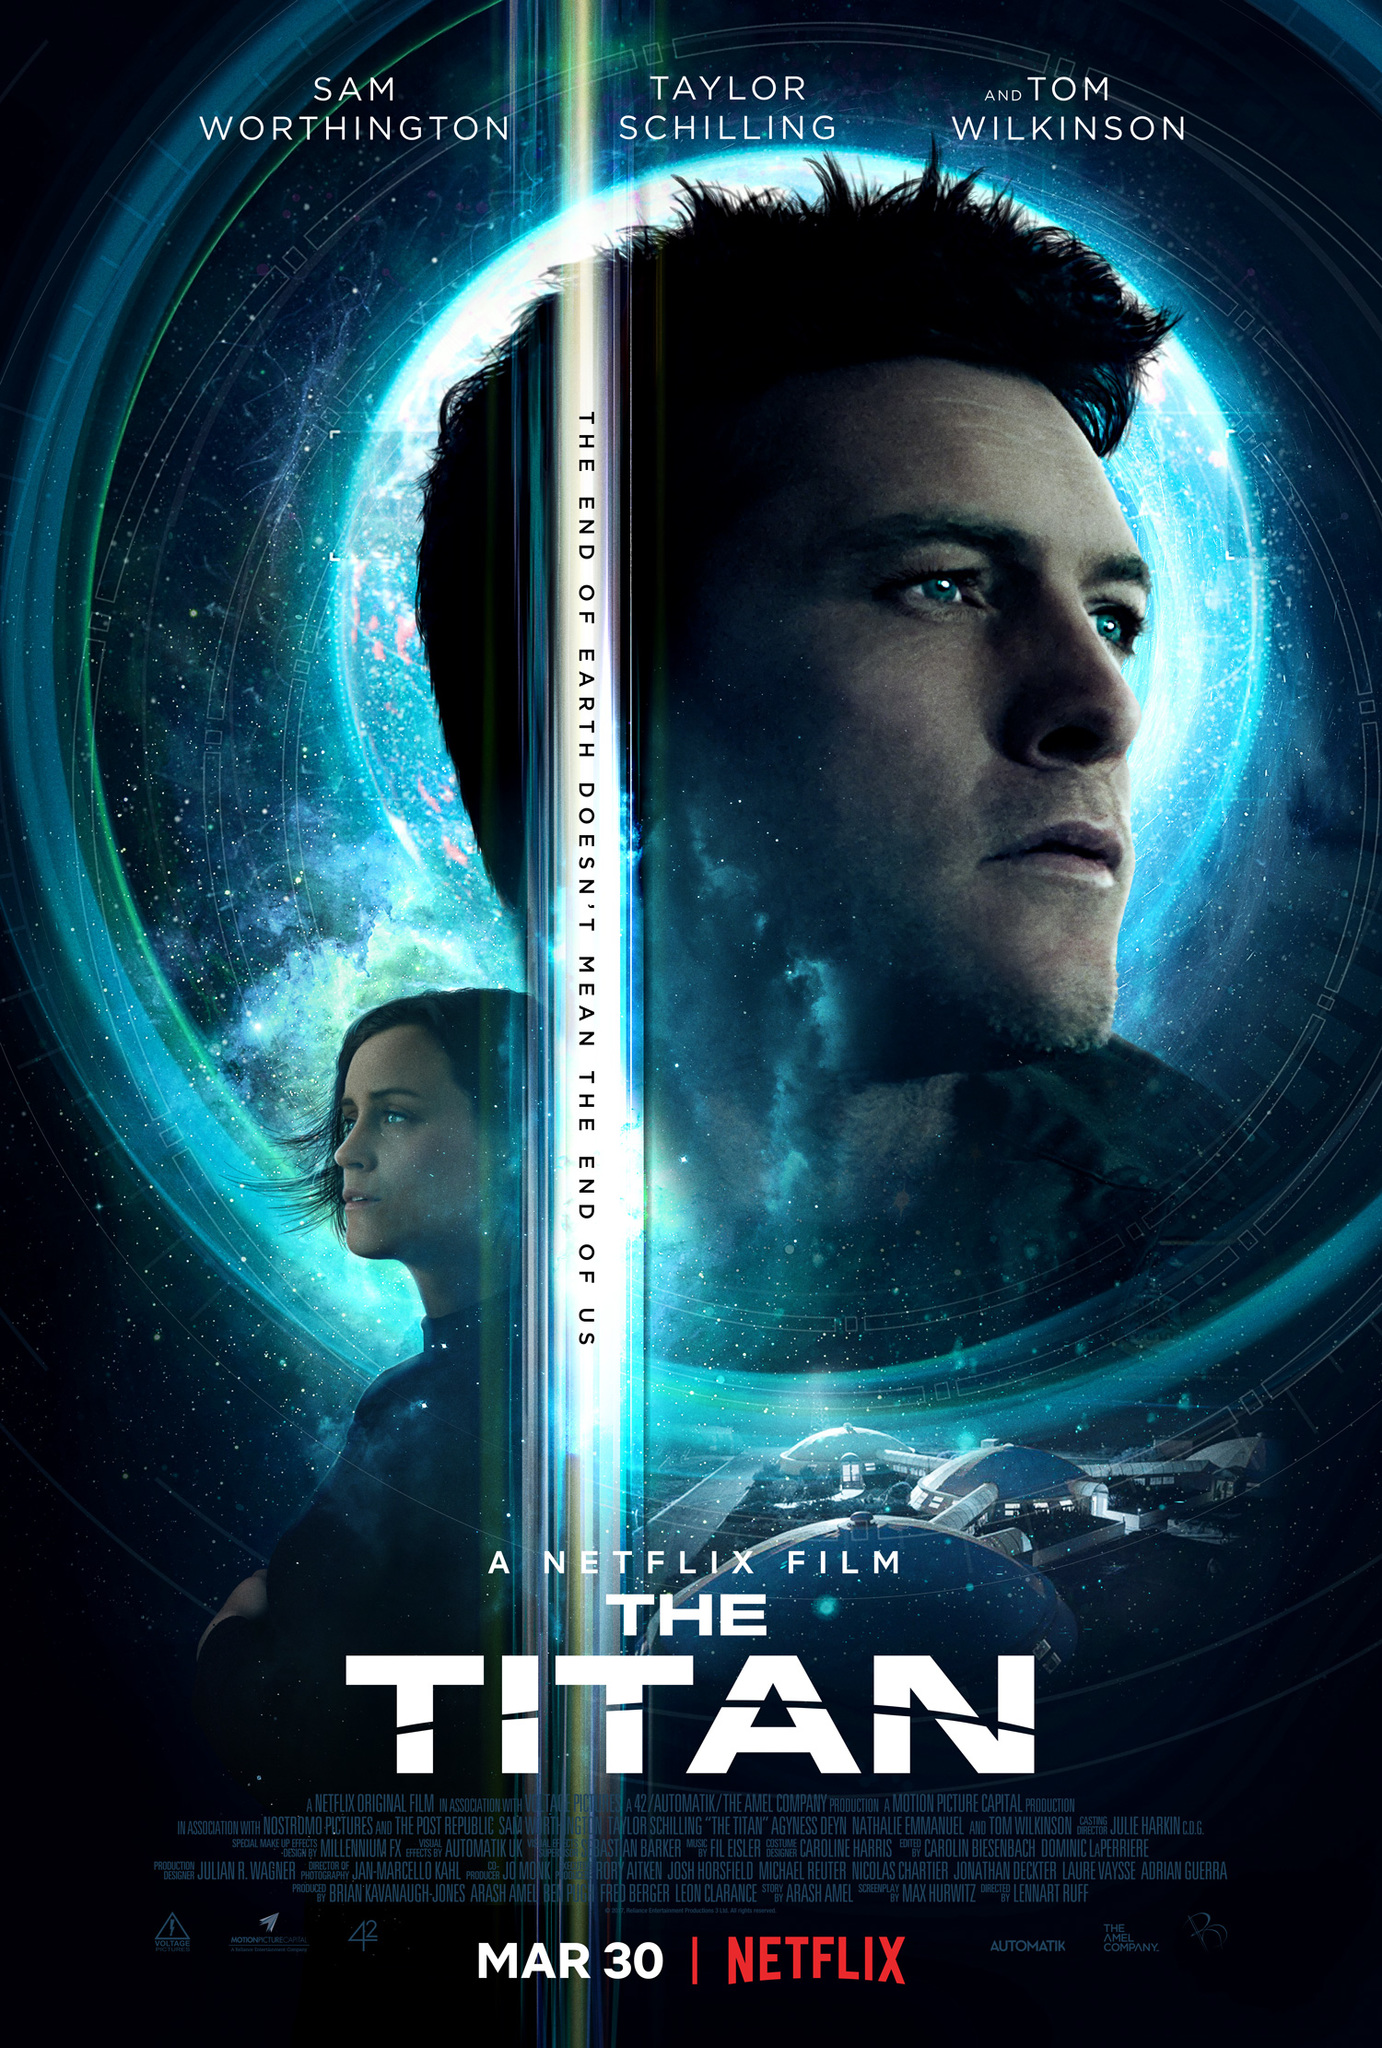 the titan.jpg